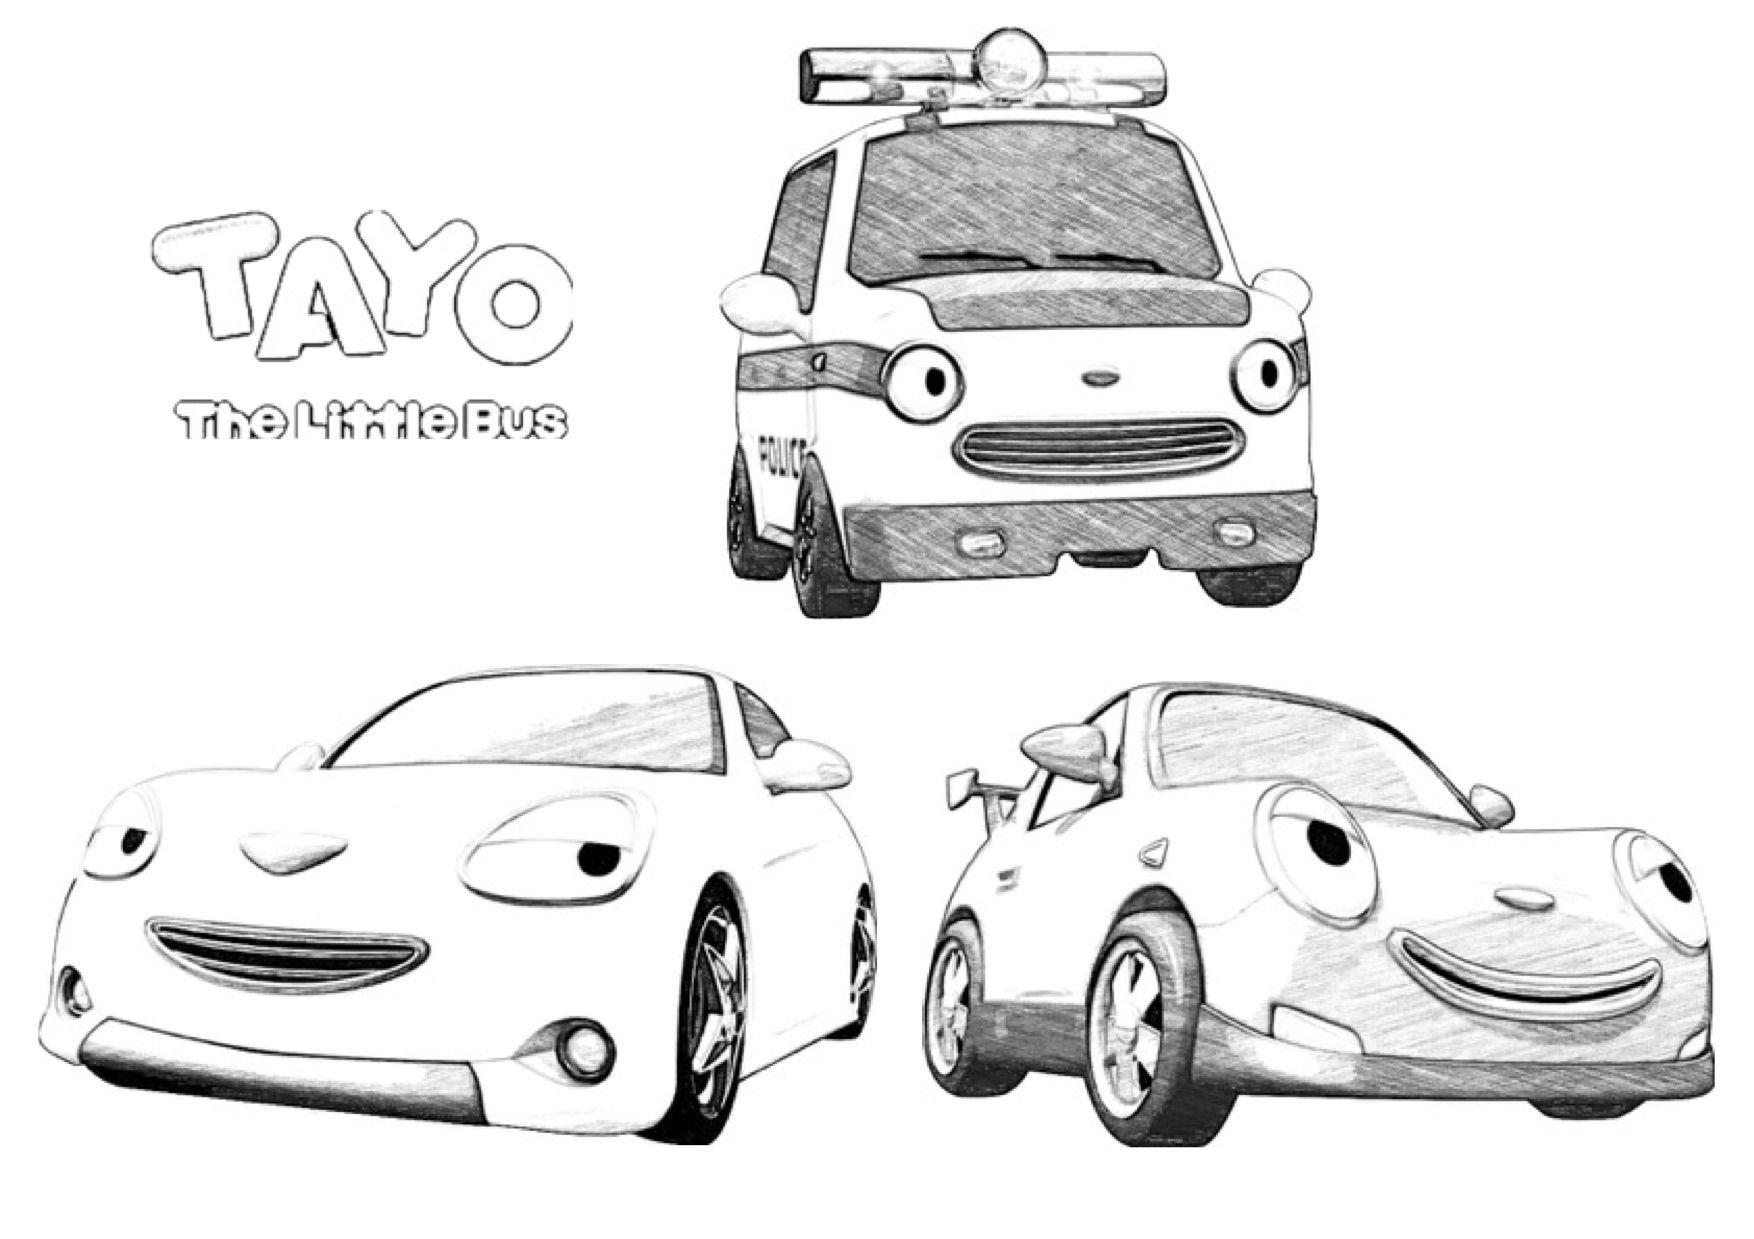 Bus Coloring Pages Tayo 2020 Check More At Https Bo Peep Club